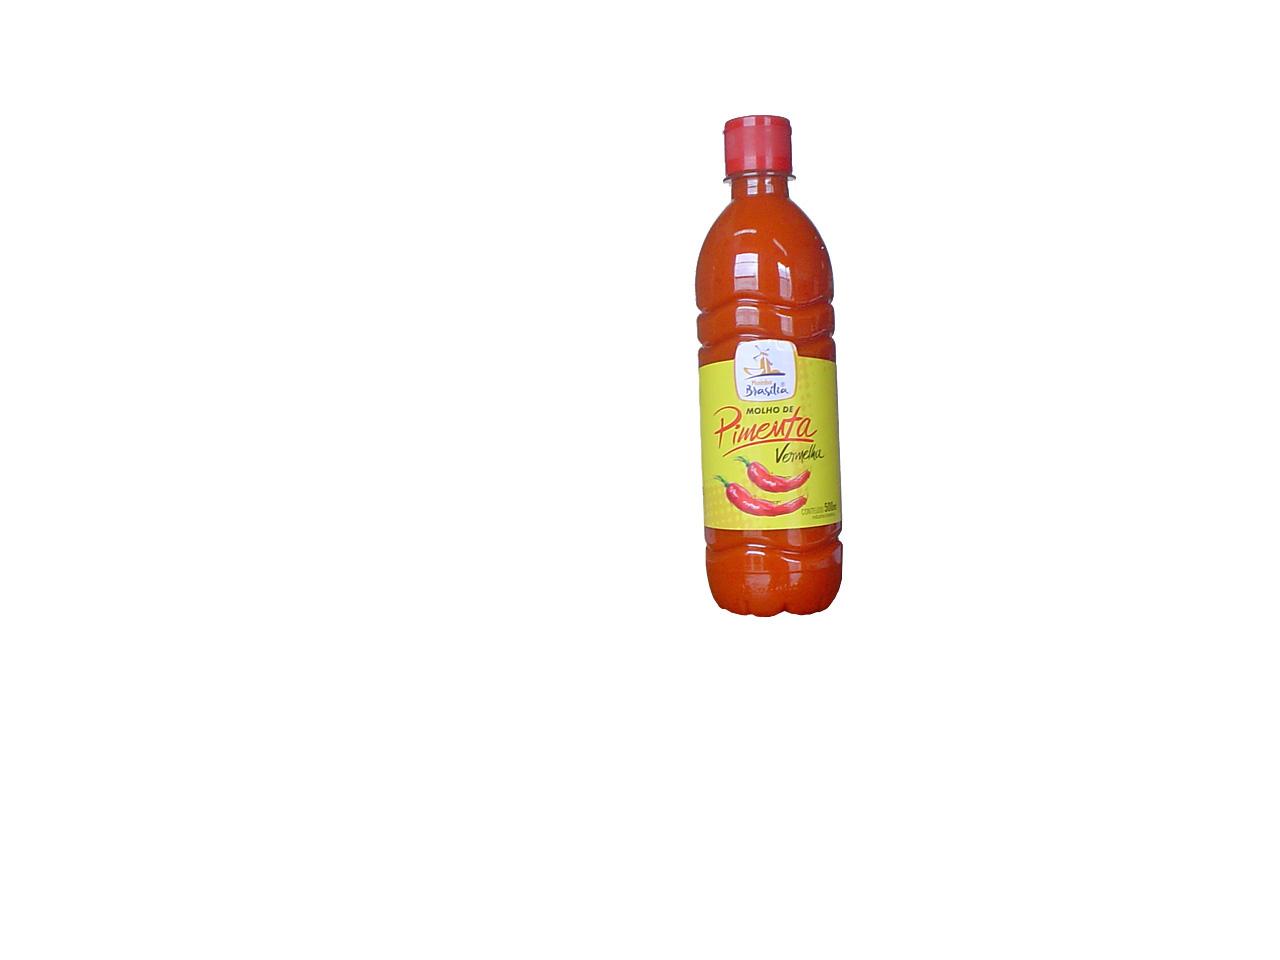 Cod.377-Molho pimenta vermelha 500ml